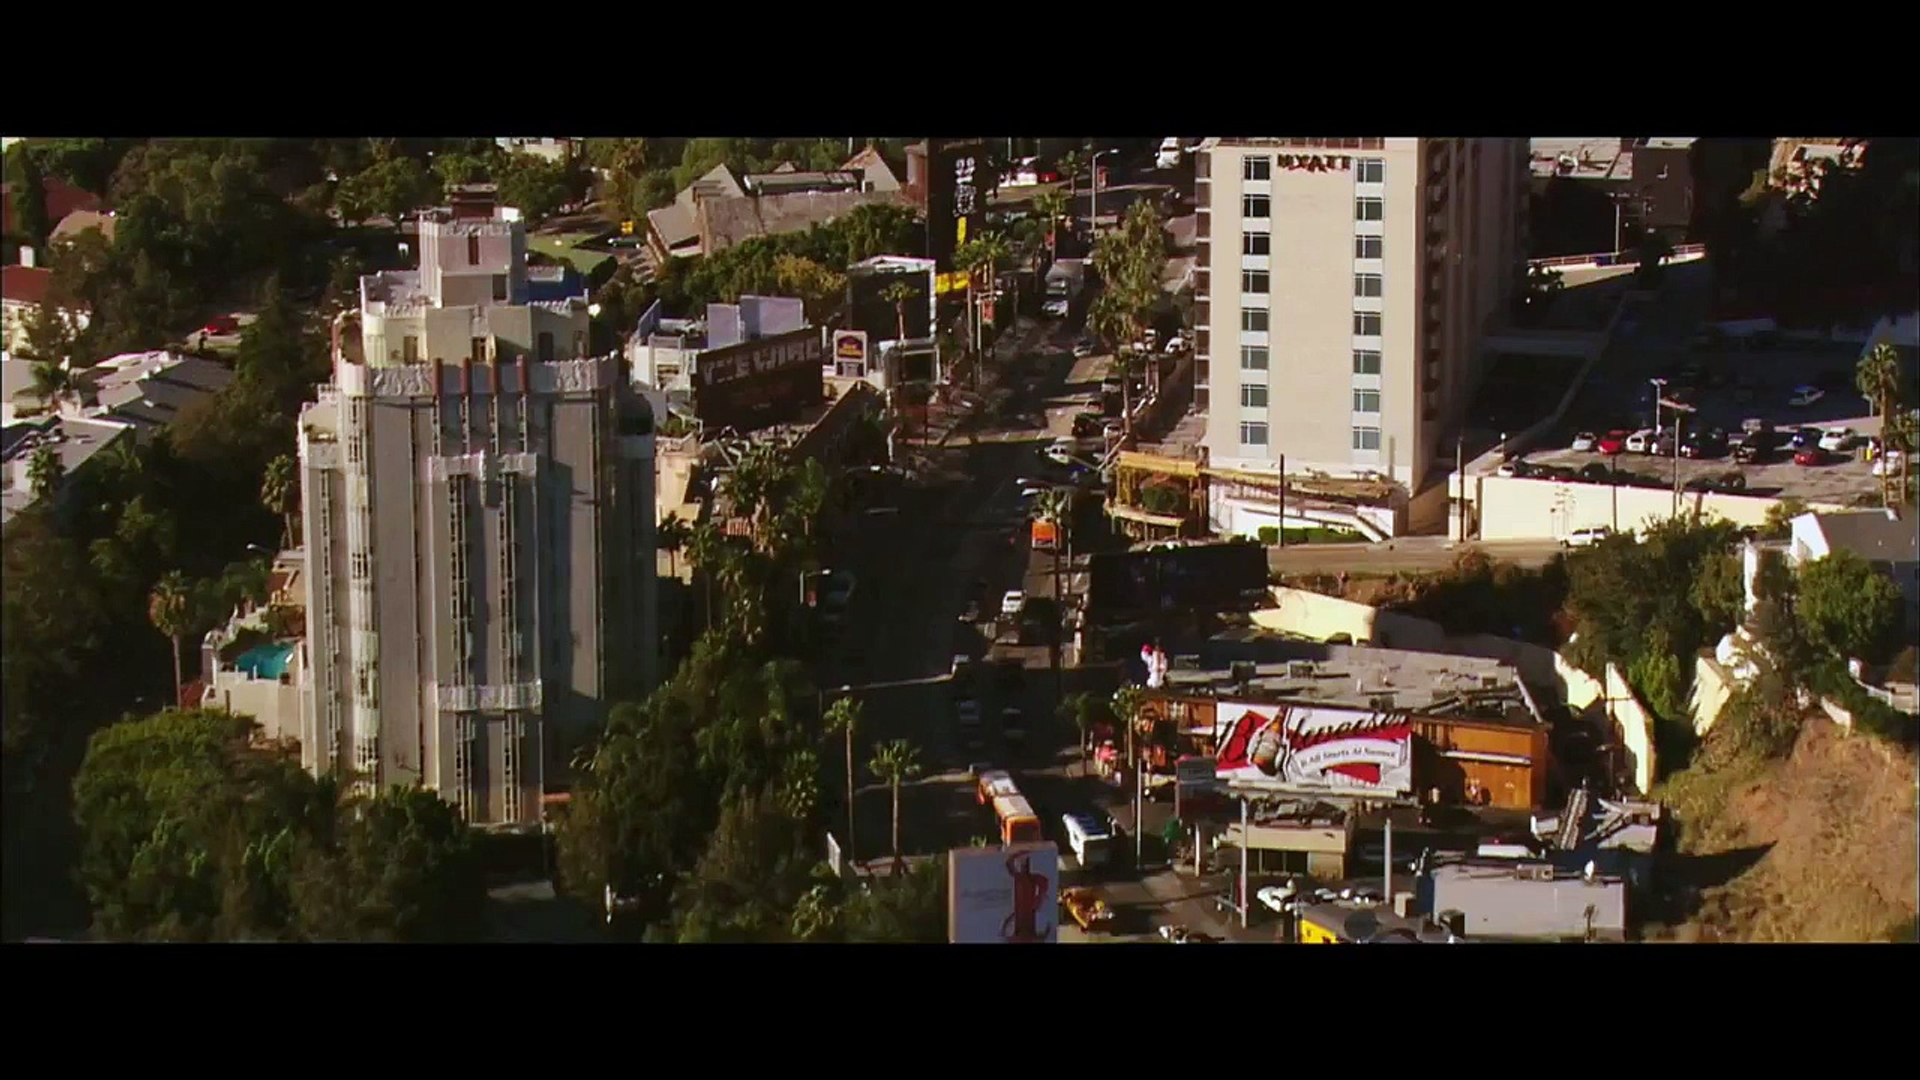 The D Train Official Trailer #1 (2015) - Jack Black, James Marsden Movie HD